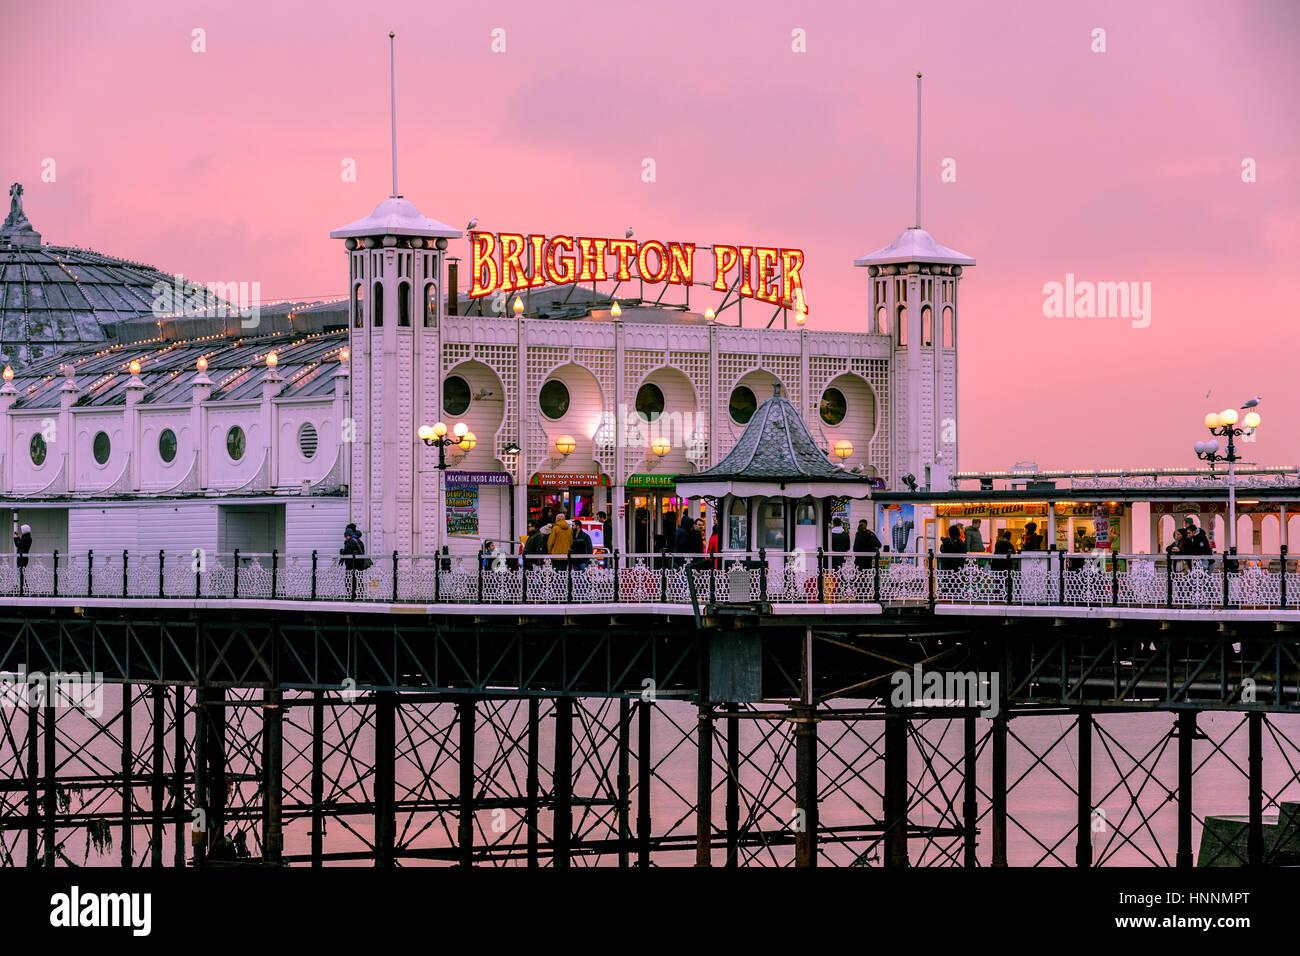 A beautiful Twilight sunset with a warm reddish tone at Brighton Pier, Brighton, Engalnd, UK Stock Photo